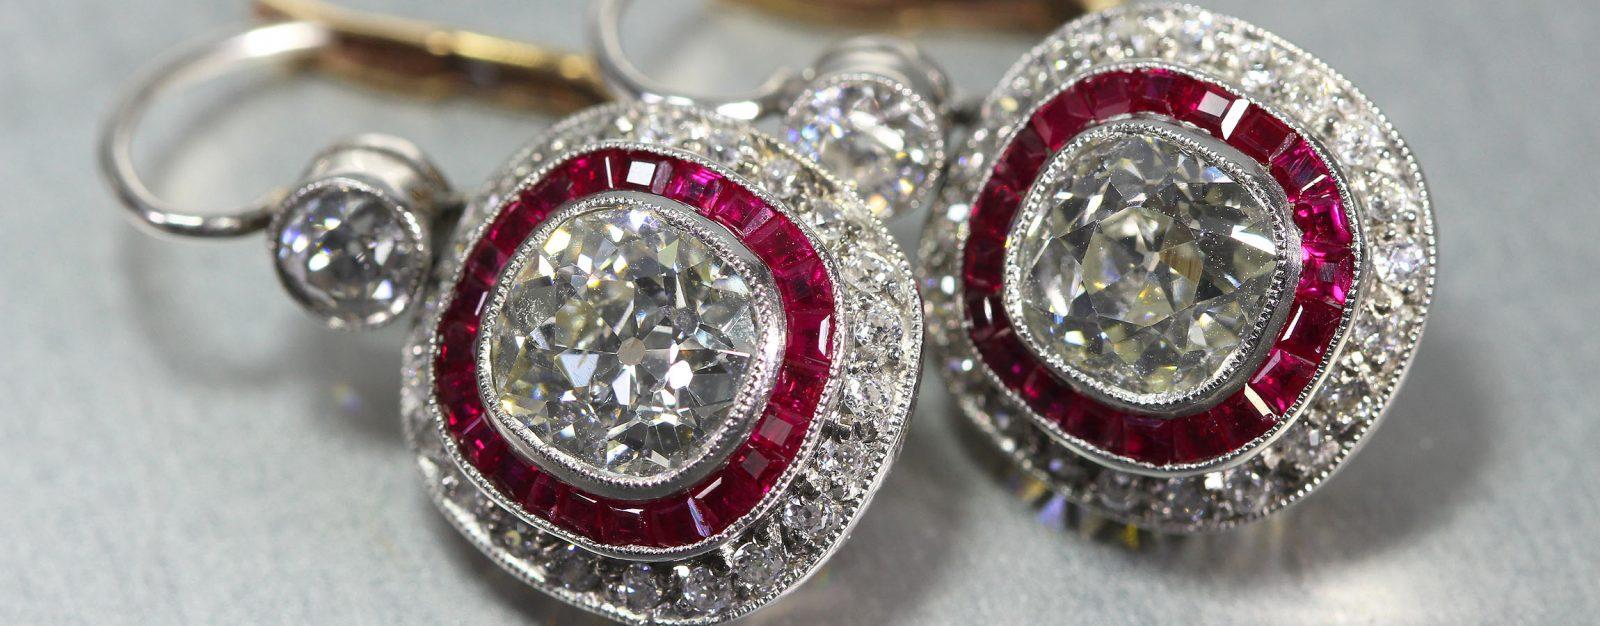 Platinum And Gold Old Mine Cut Diamond Earrings